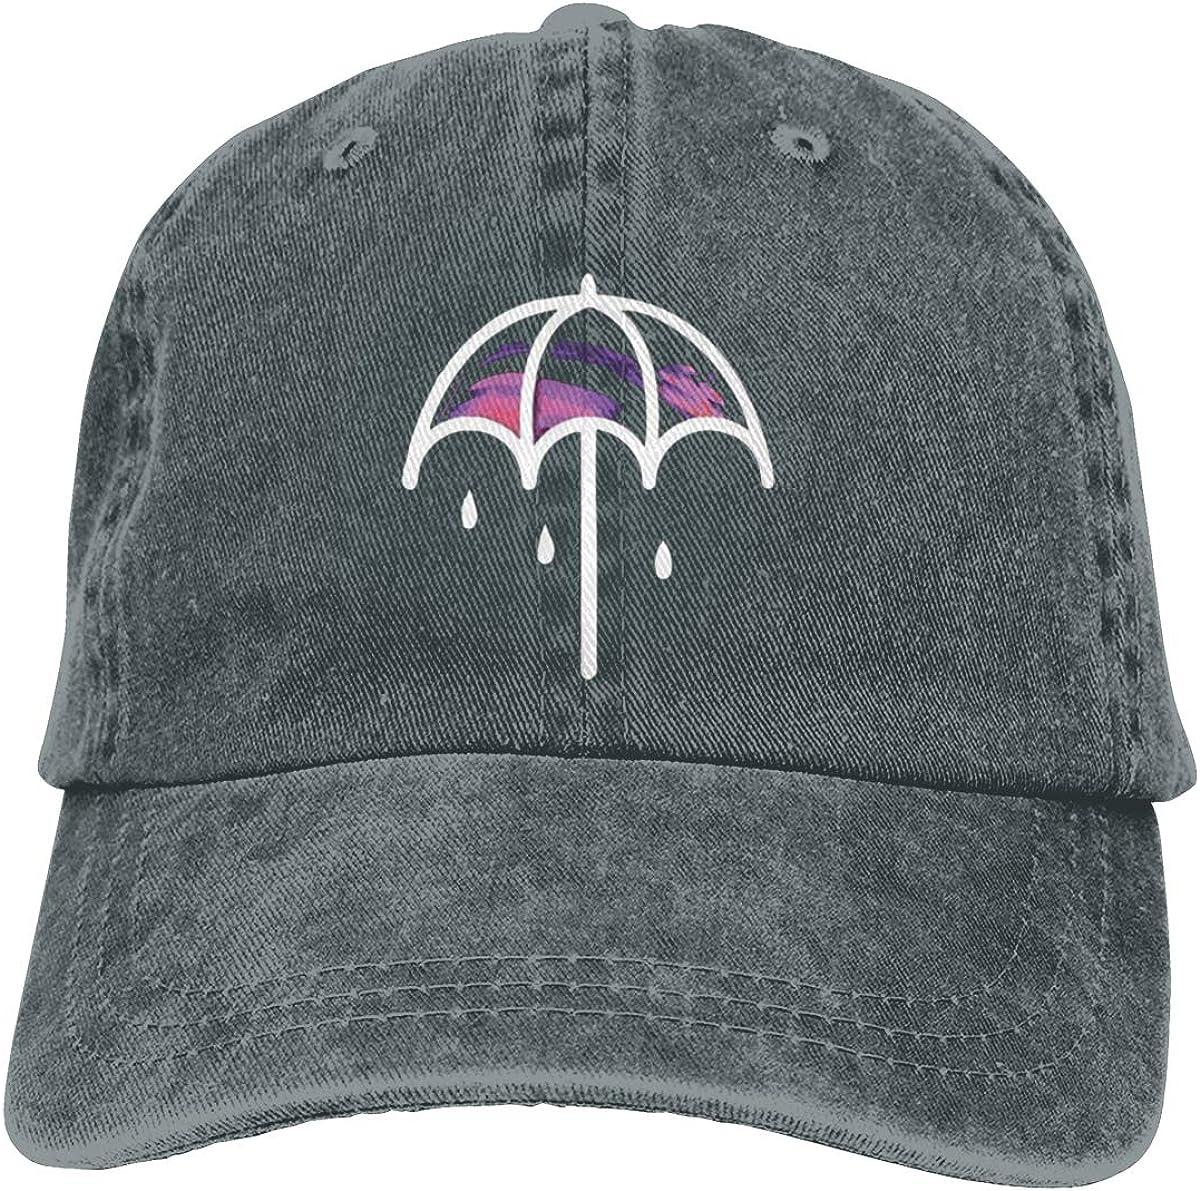 Zlizhi Leisure Bring Me The Horizon Umbrella Men Women Plain Cotton Adjustable Washed Twill Low Profile Baseball Cap Hat